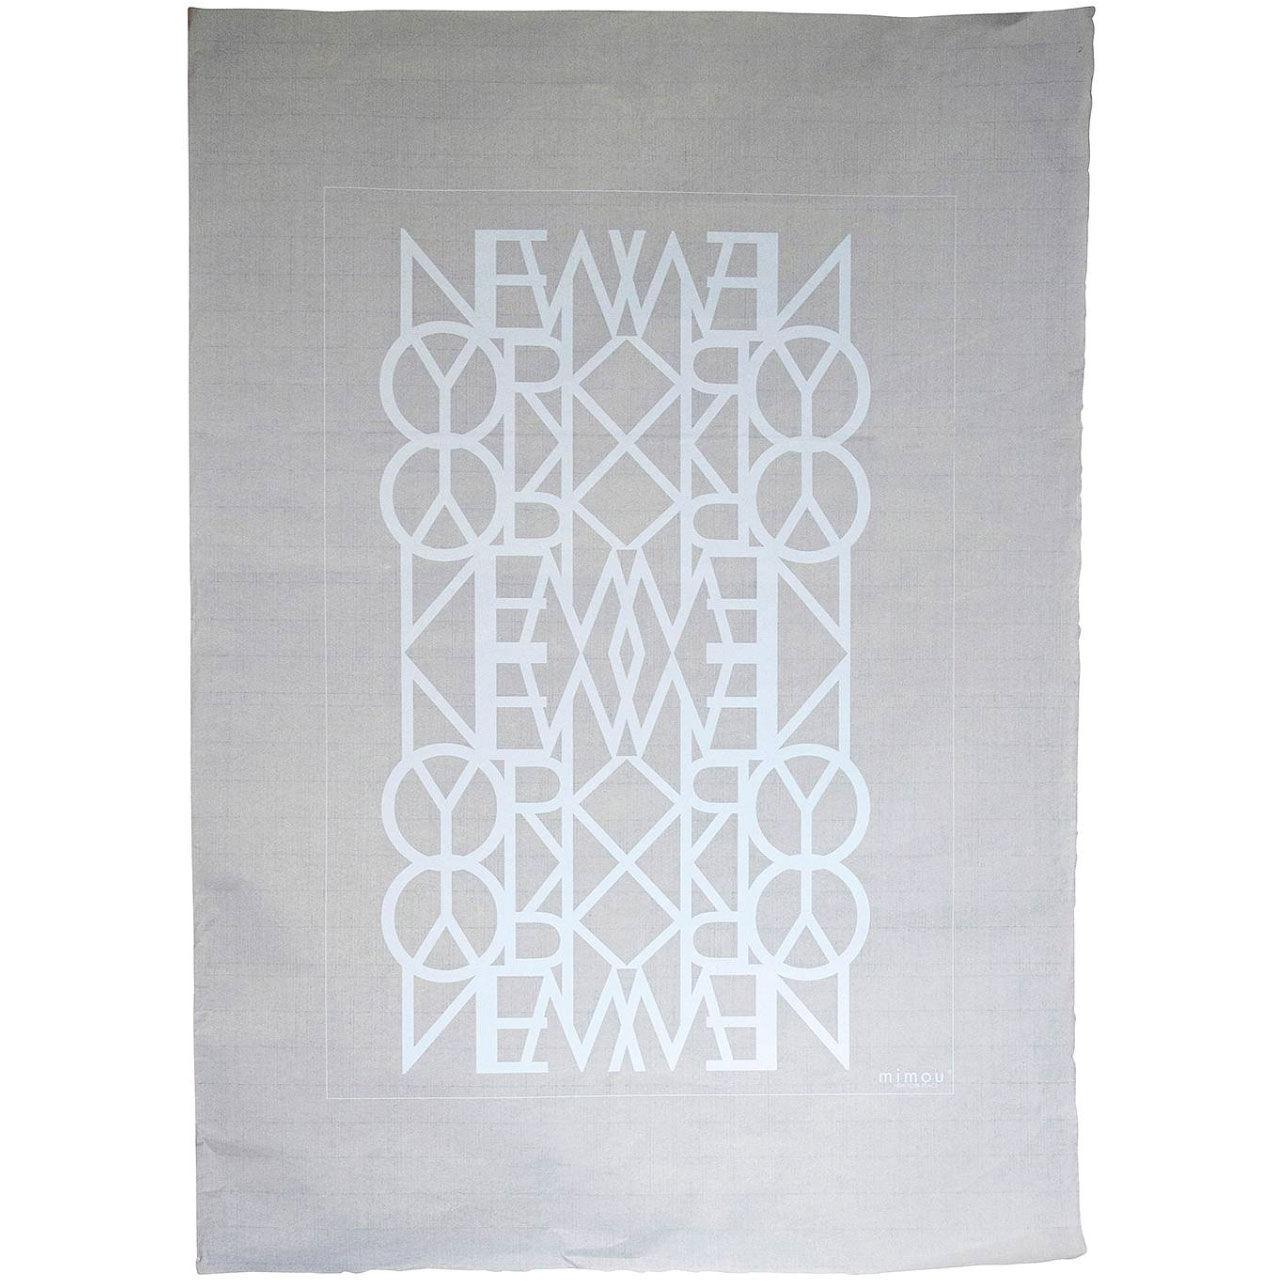 Mimou-New York Peace Juliste 50x70 cm, Valkoinen